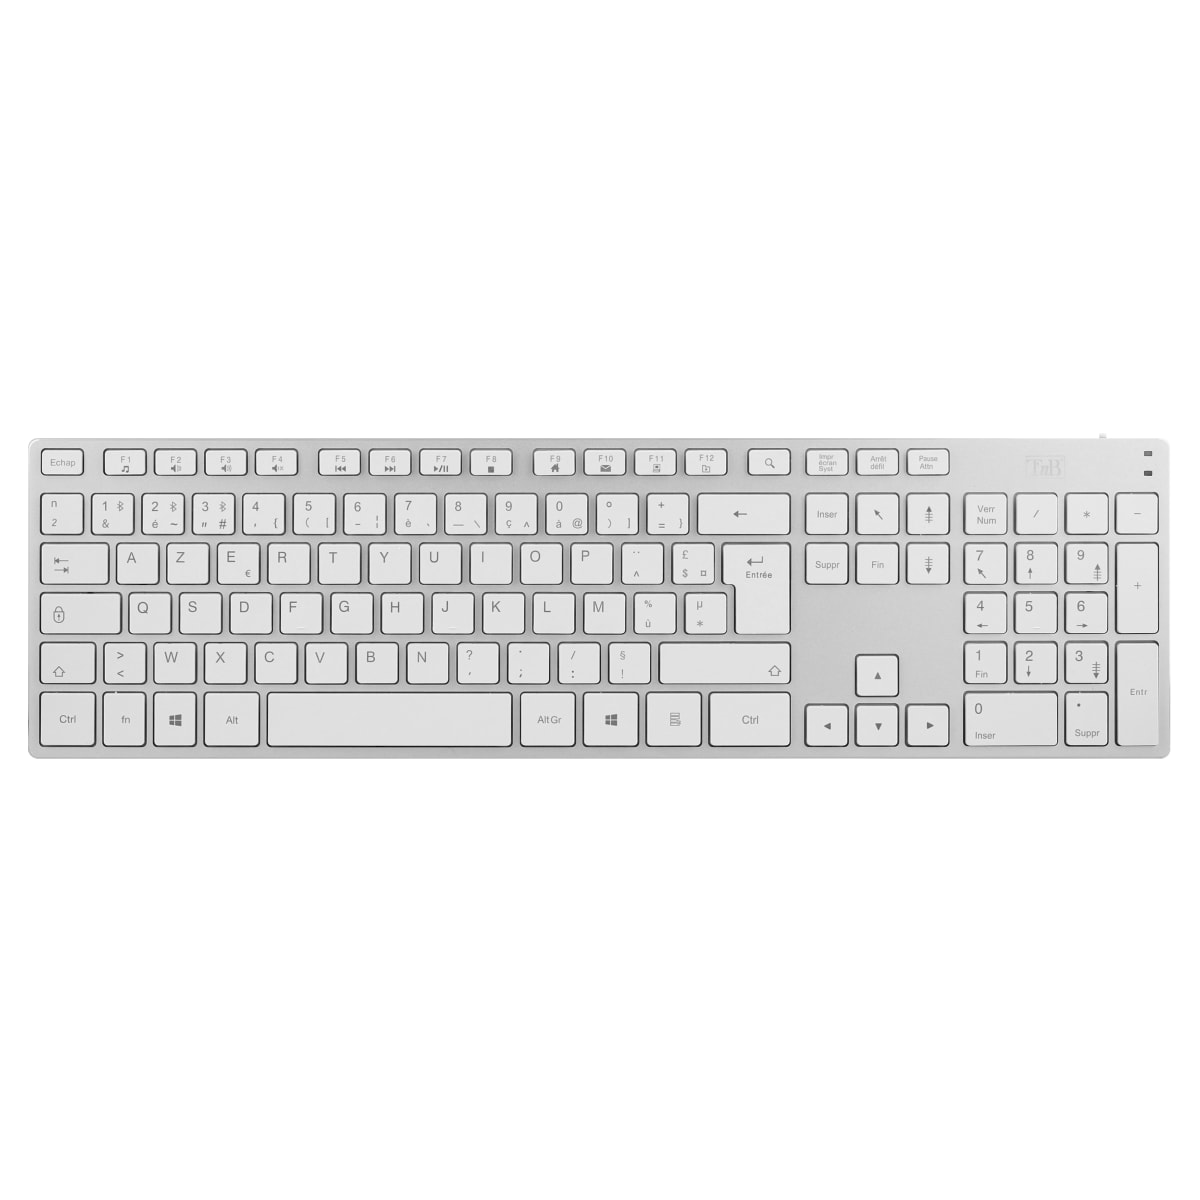 Rechargeable Bluetooh keyboard for WINDOWS